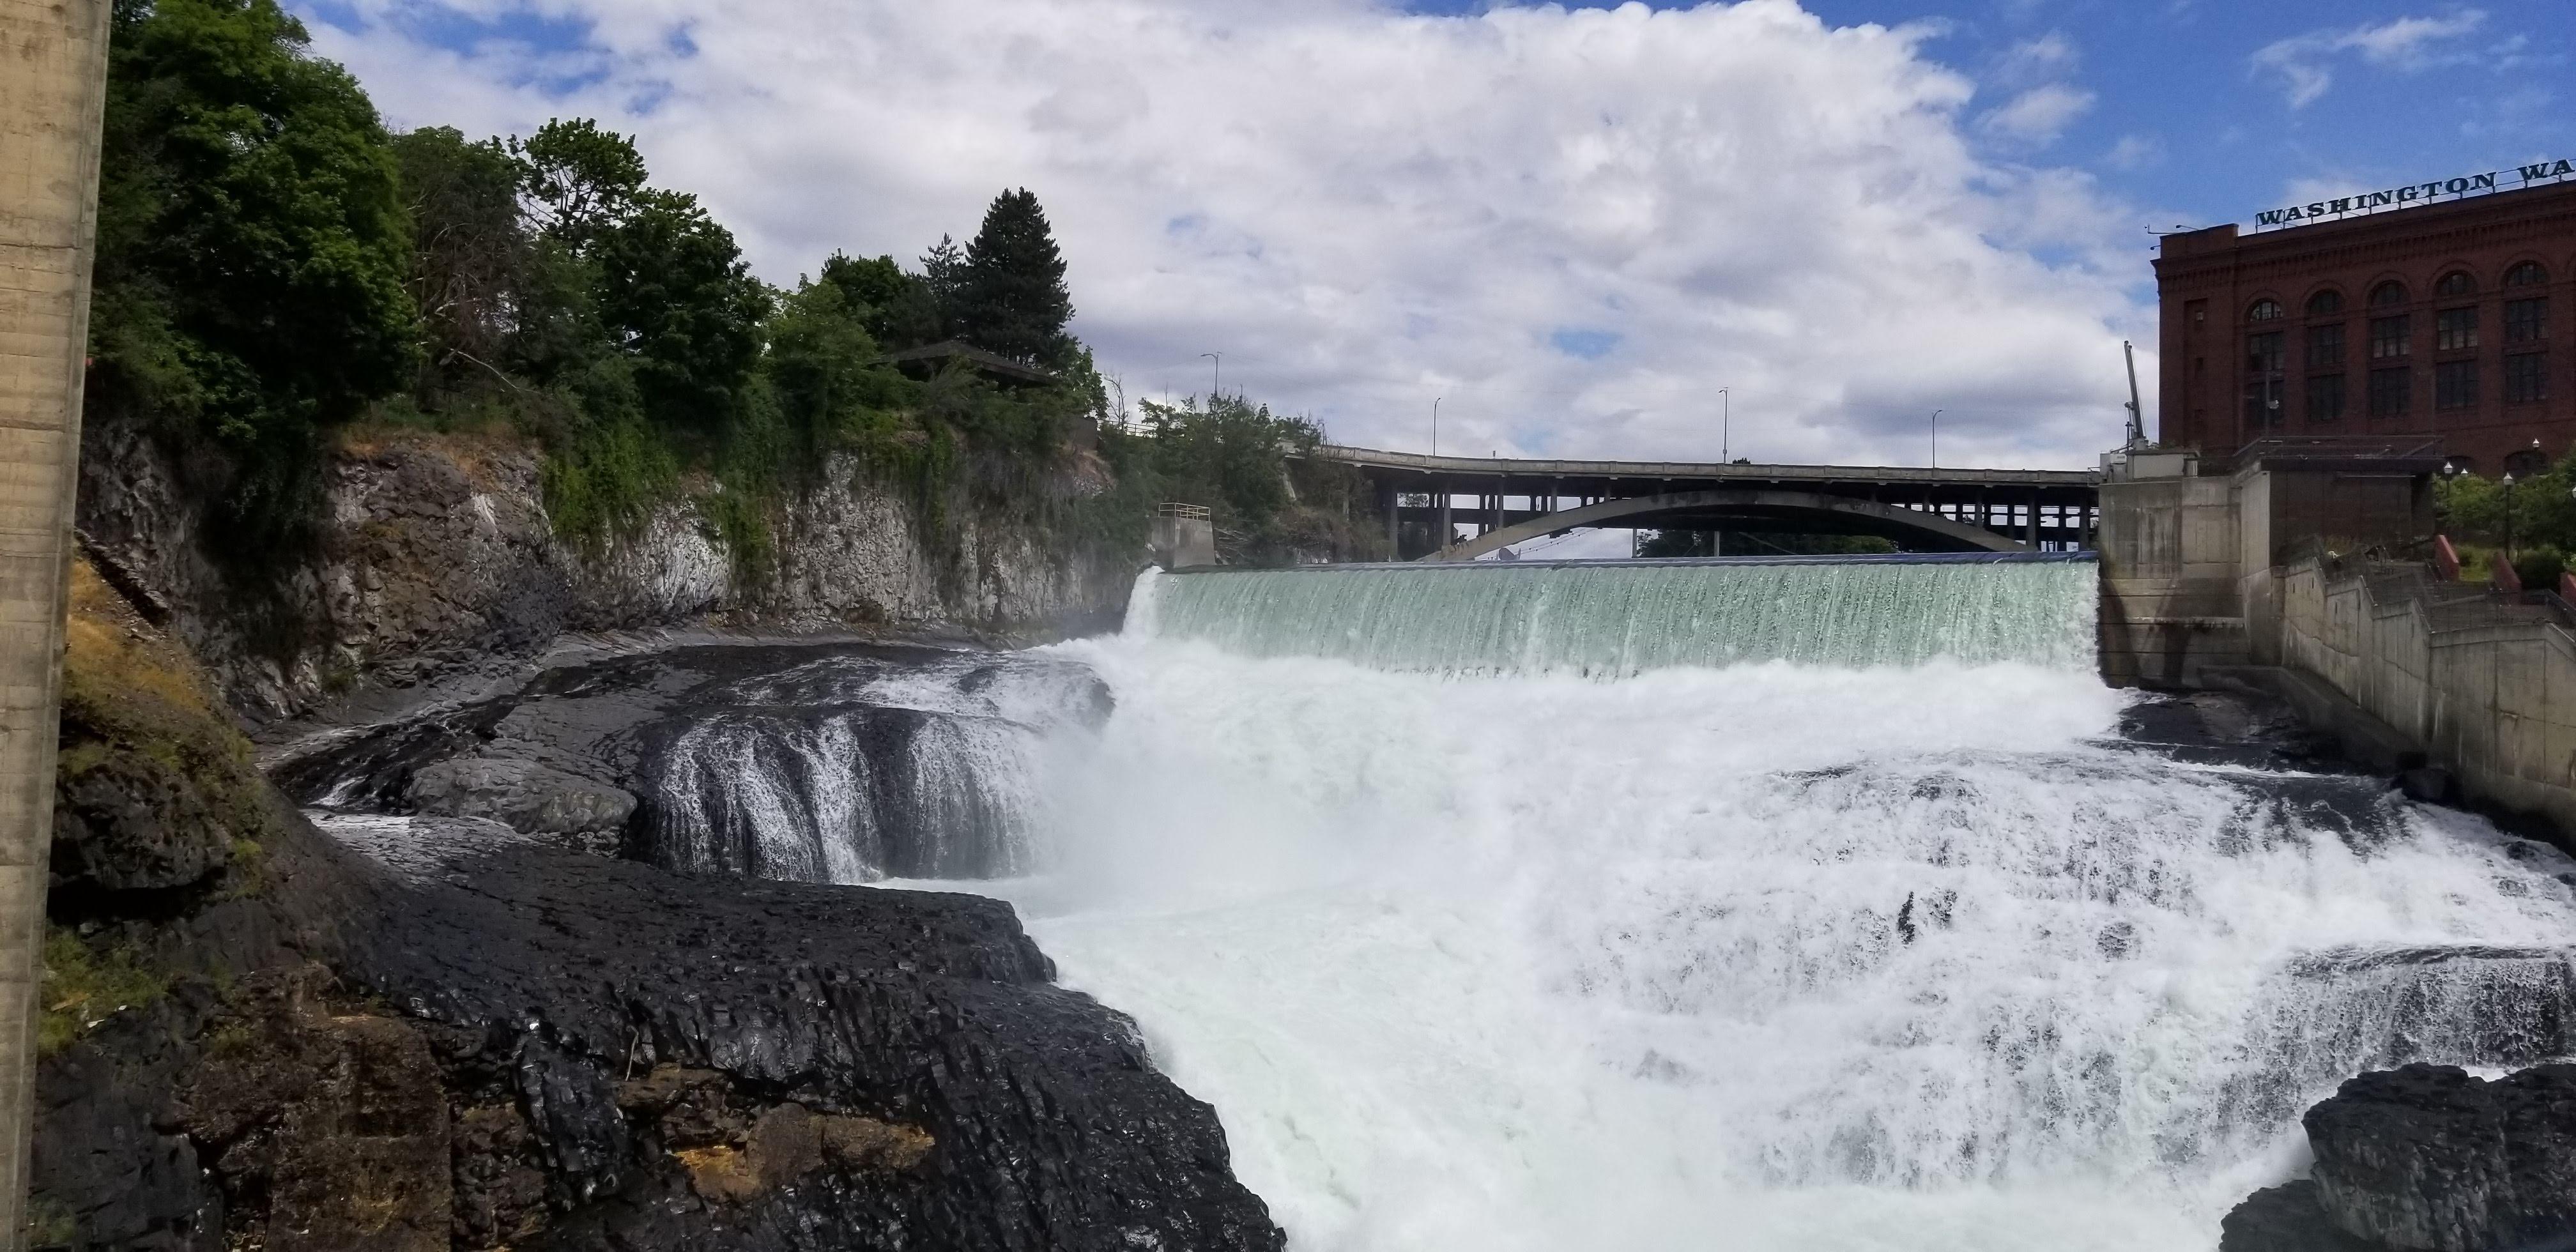 Lower Falls on the Spokane River